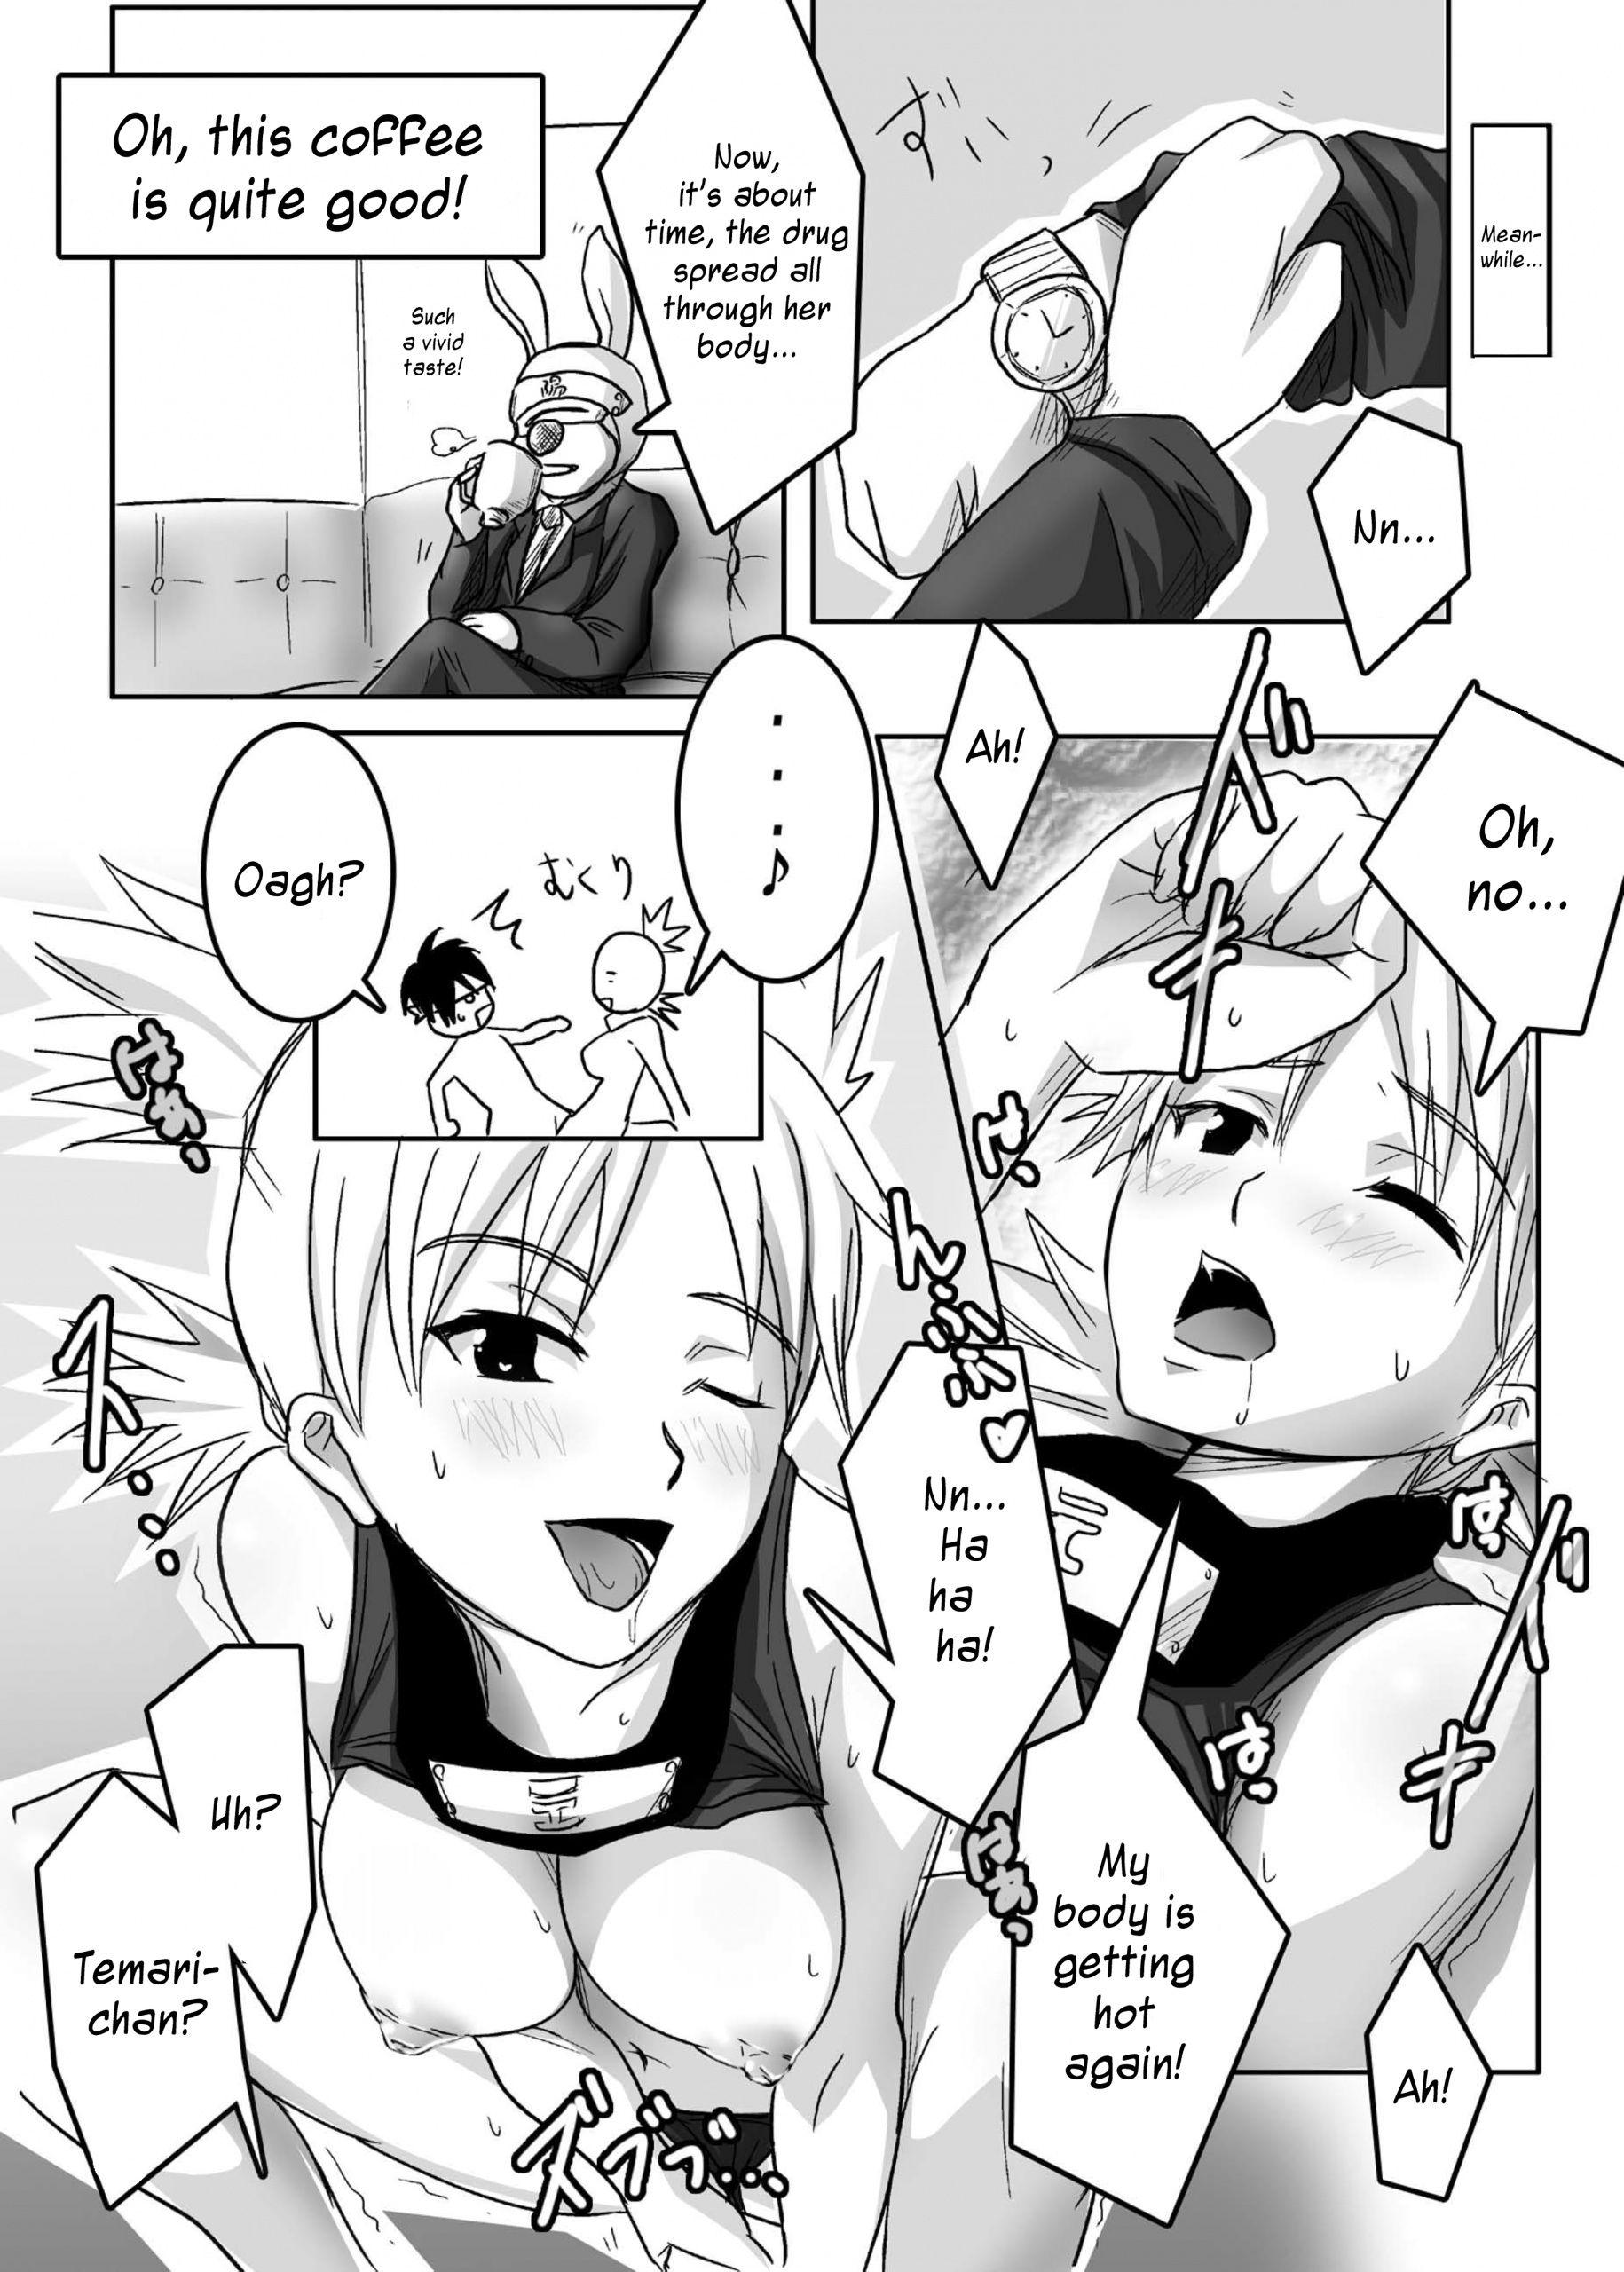 Nyonin han hentai manga picture 40